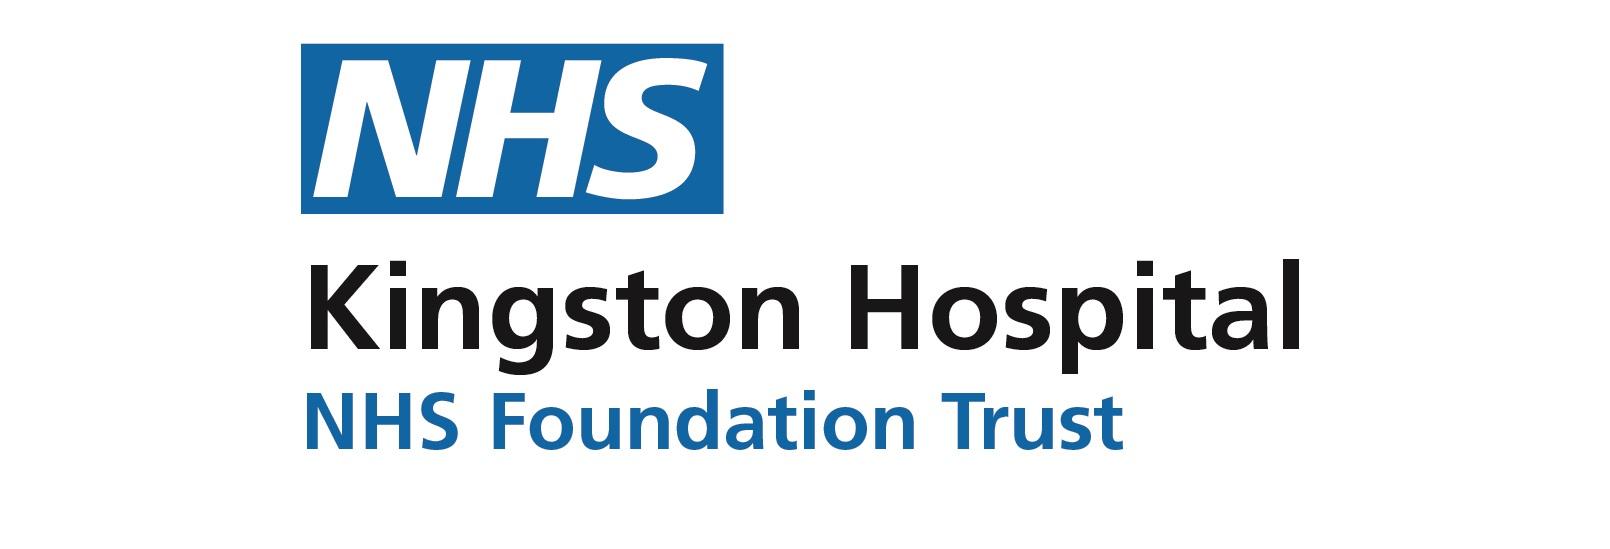 Kingston Hospitals NHS Foundation Trust Logo